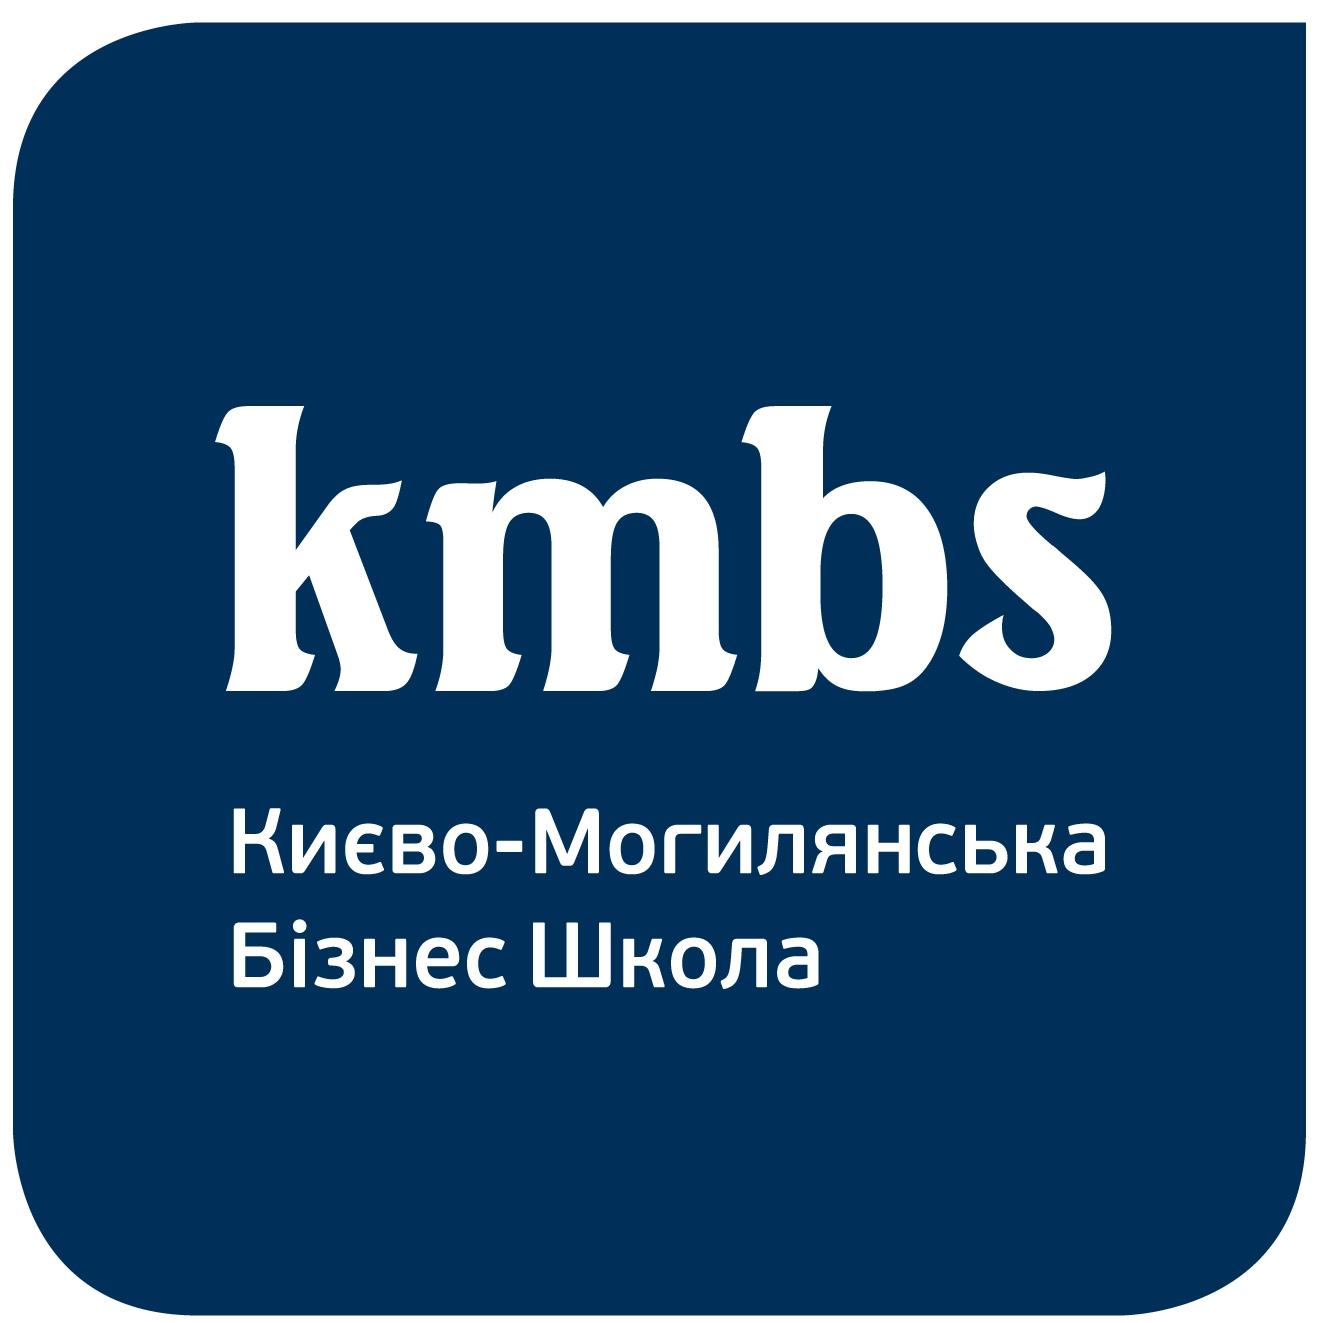 logo-new-ukr_2000_2000